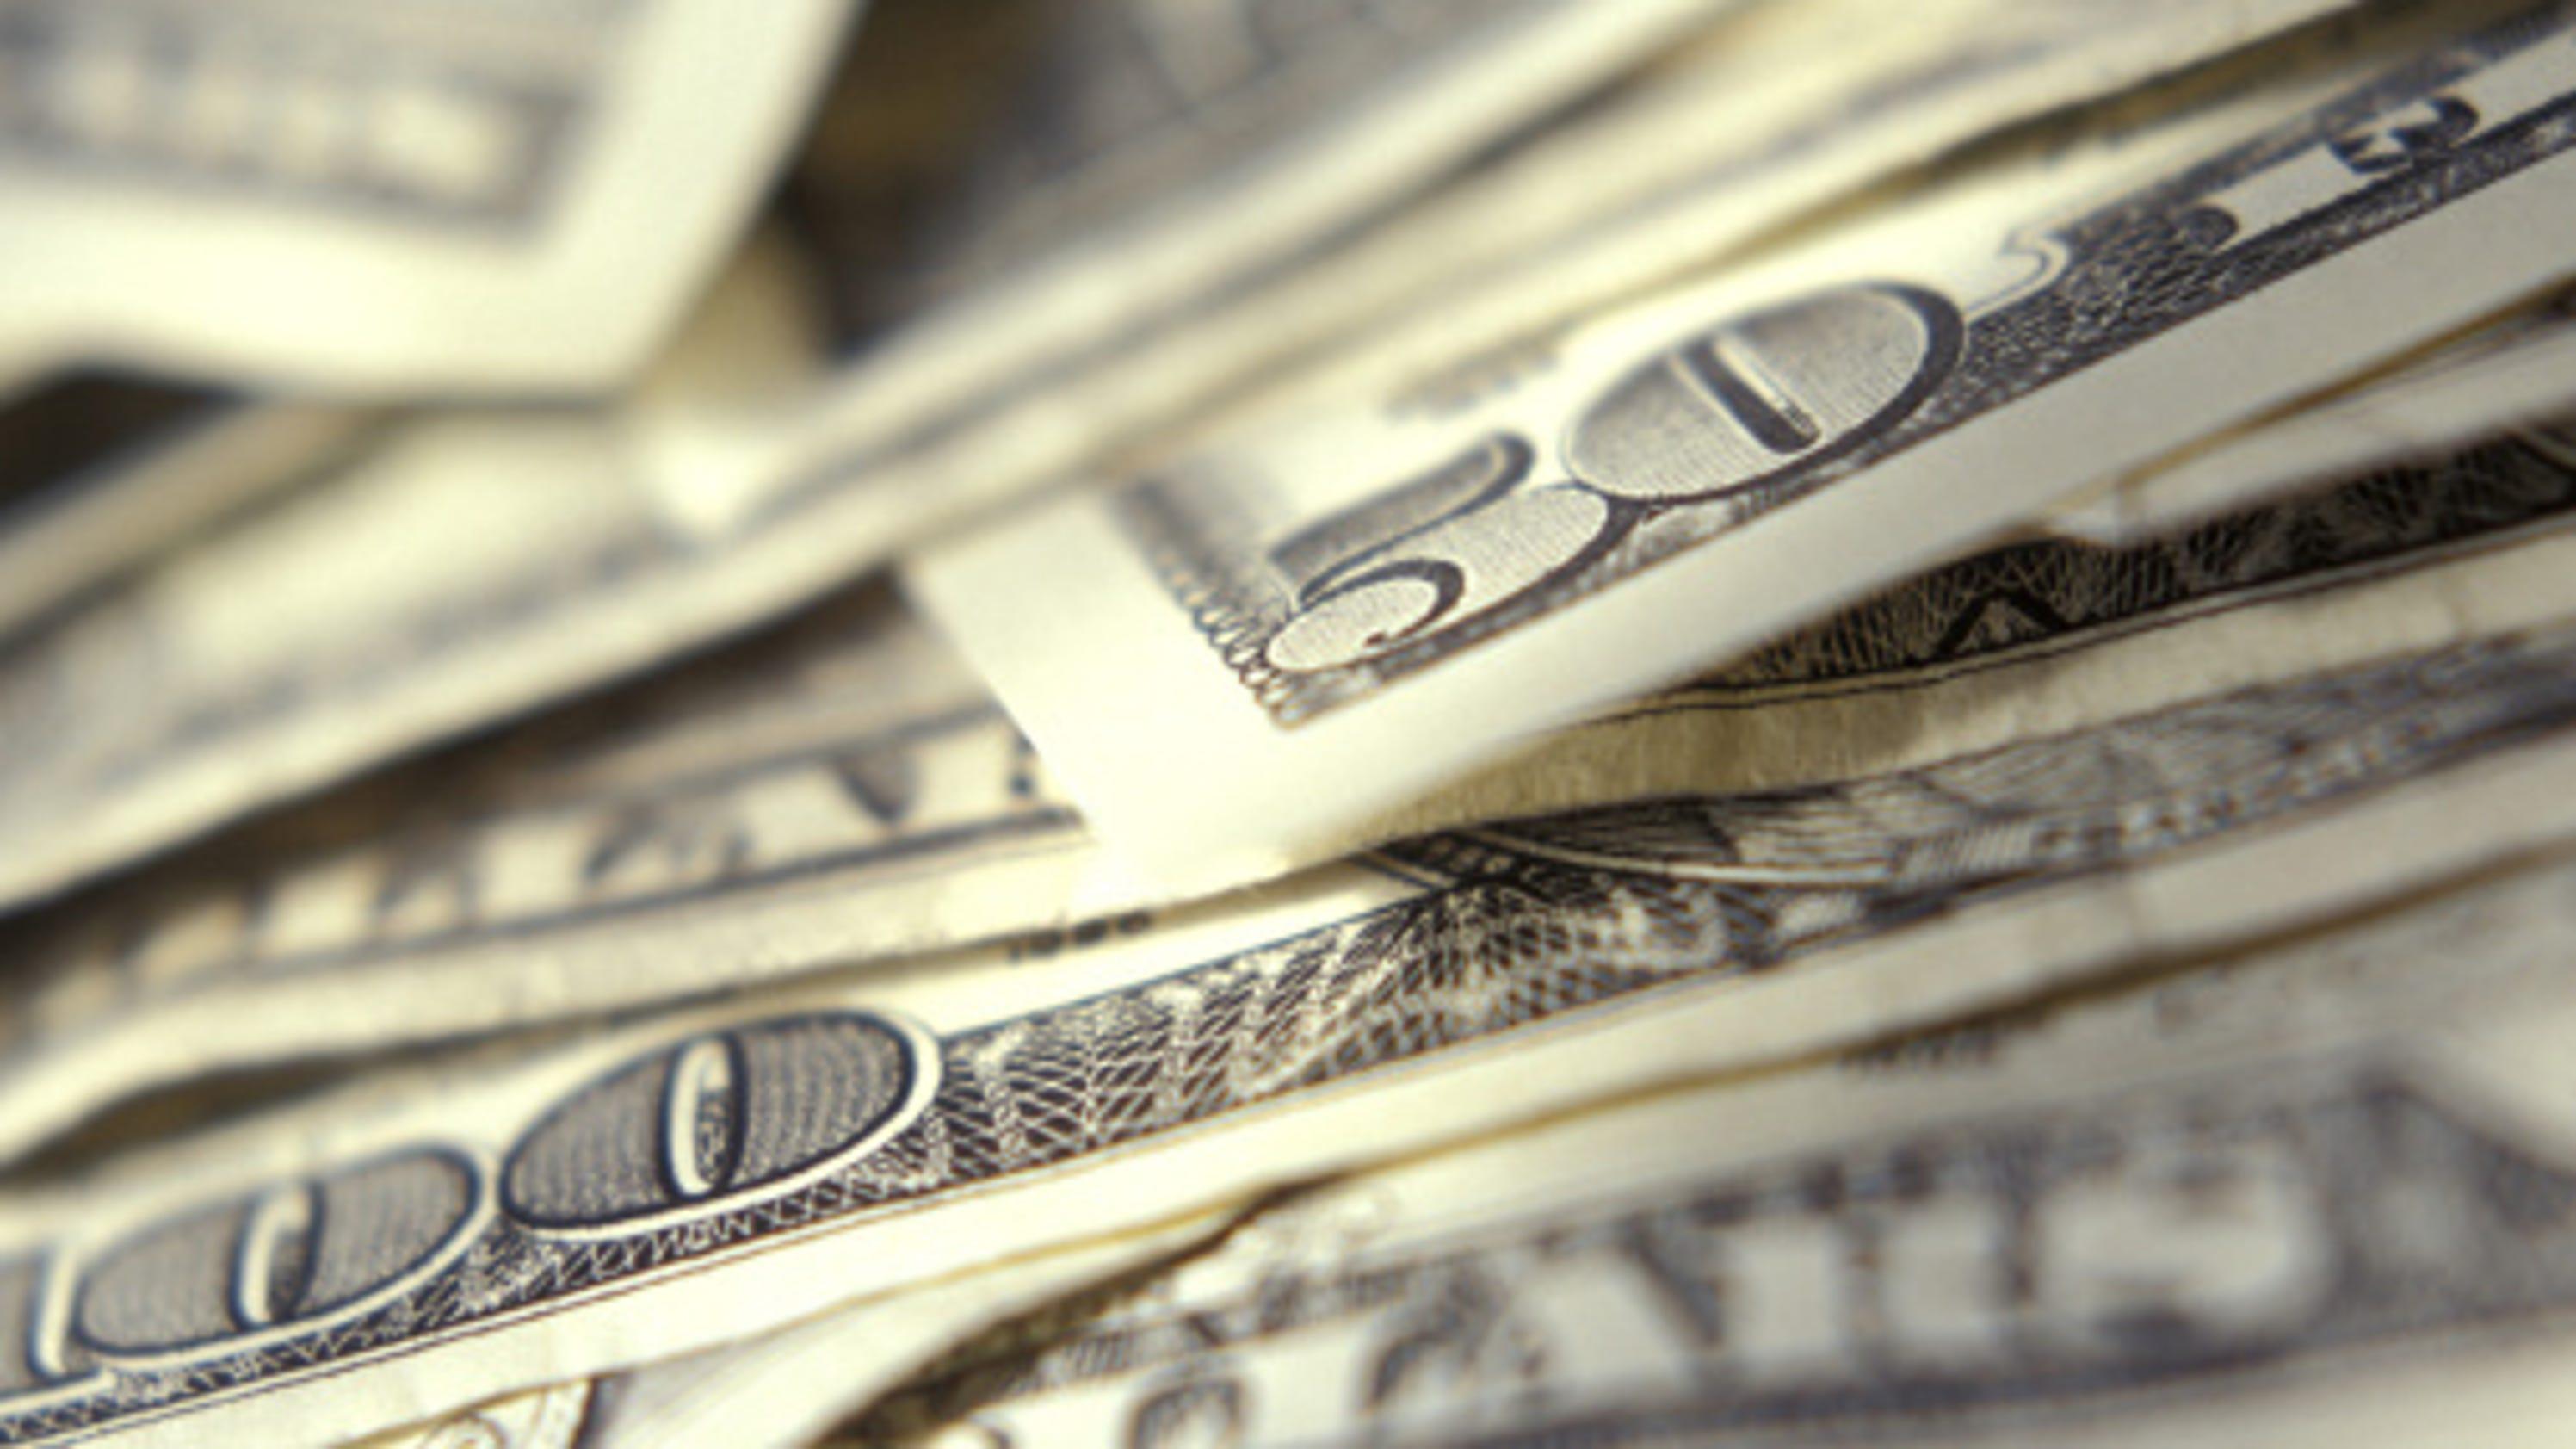 H&r block cash loan picture 1